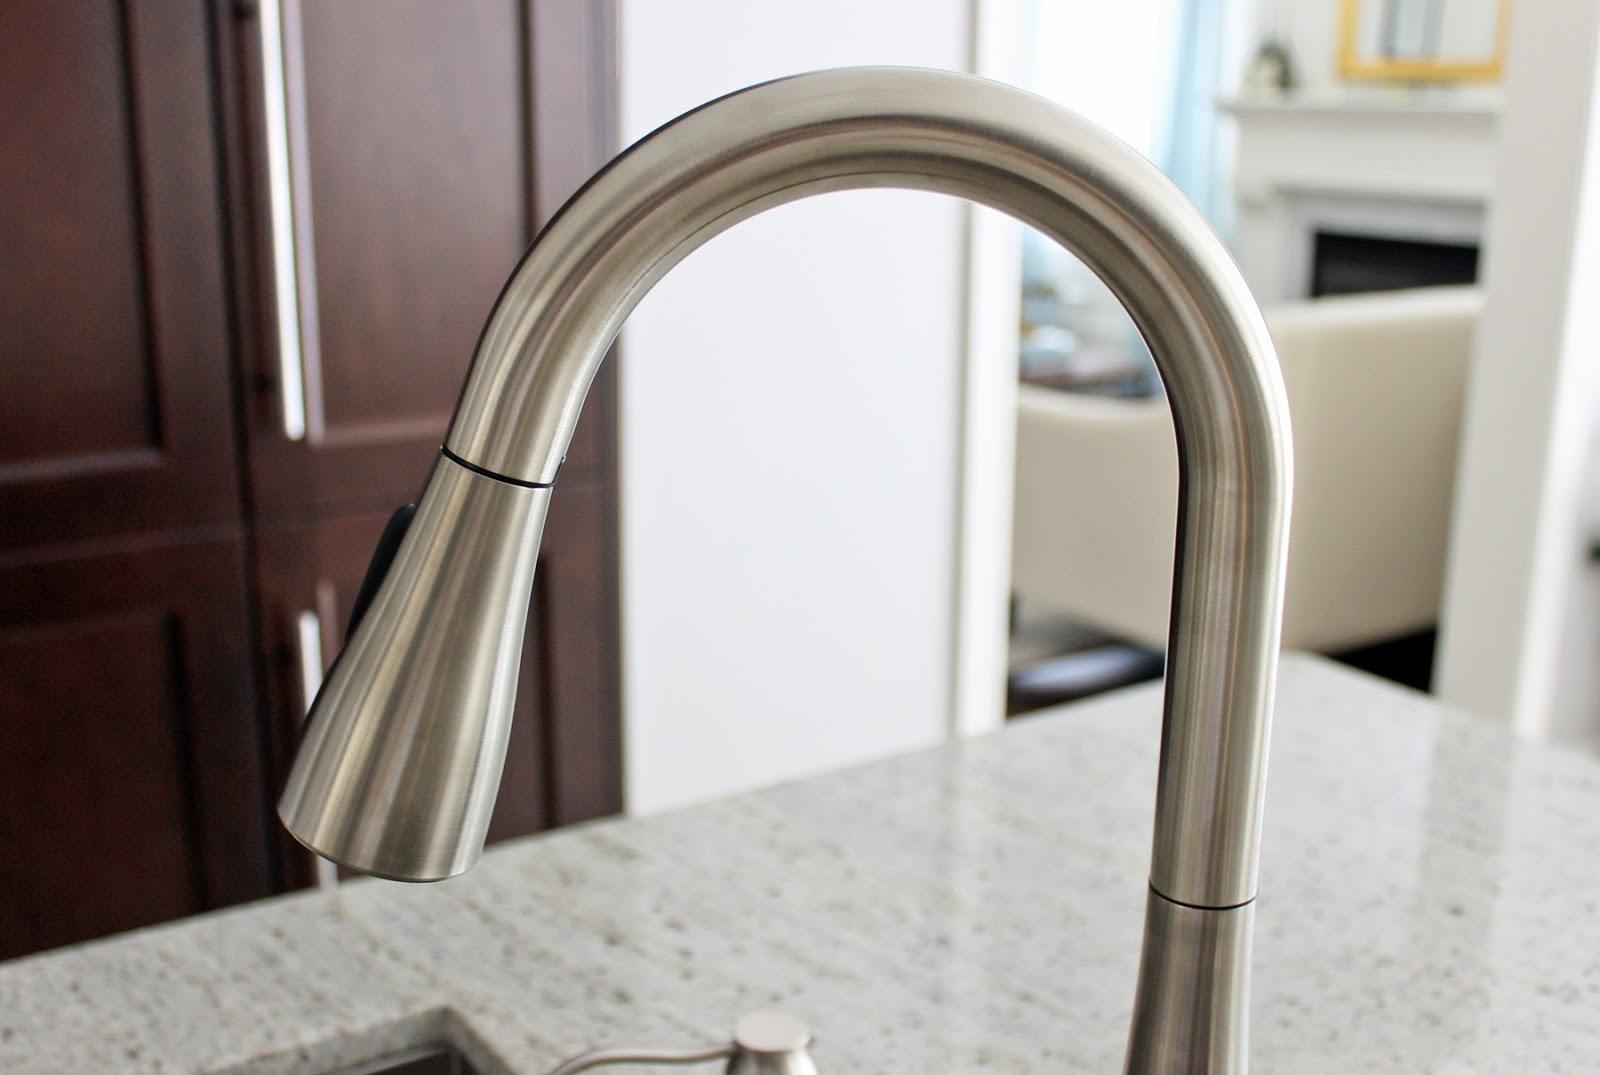 Ideas, moen kitchen faucet moen kitchen moen kitchen faucets help moen intended for proportions 1600 x 1075  .